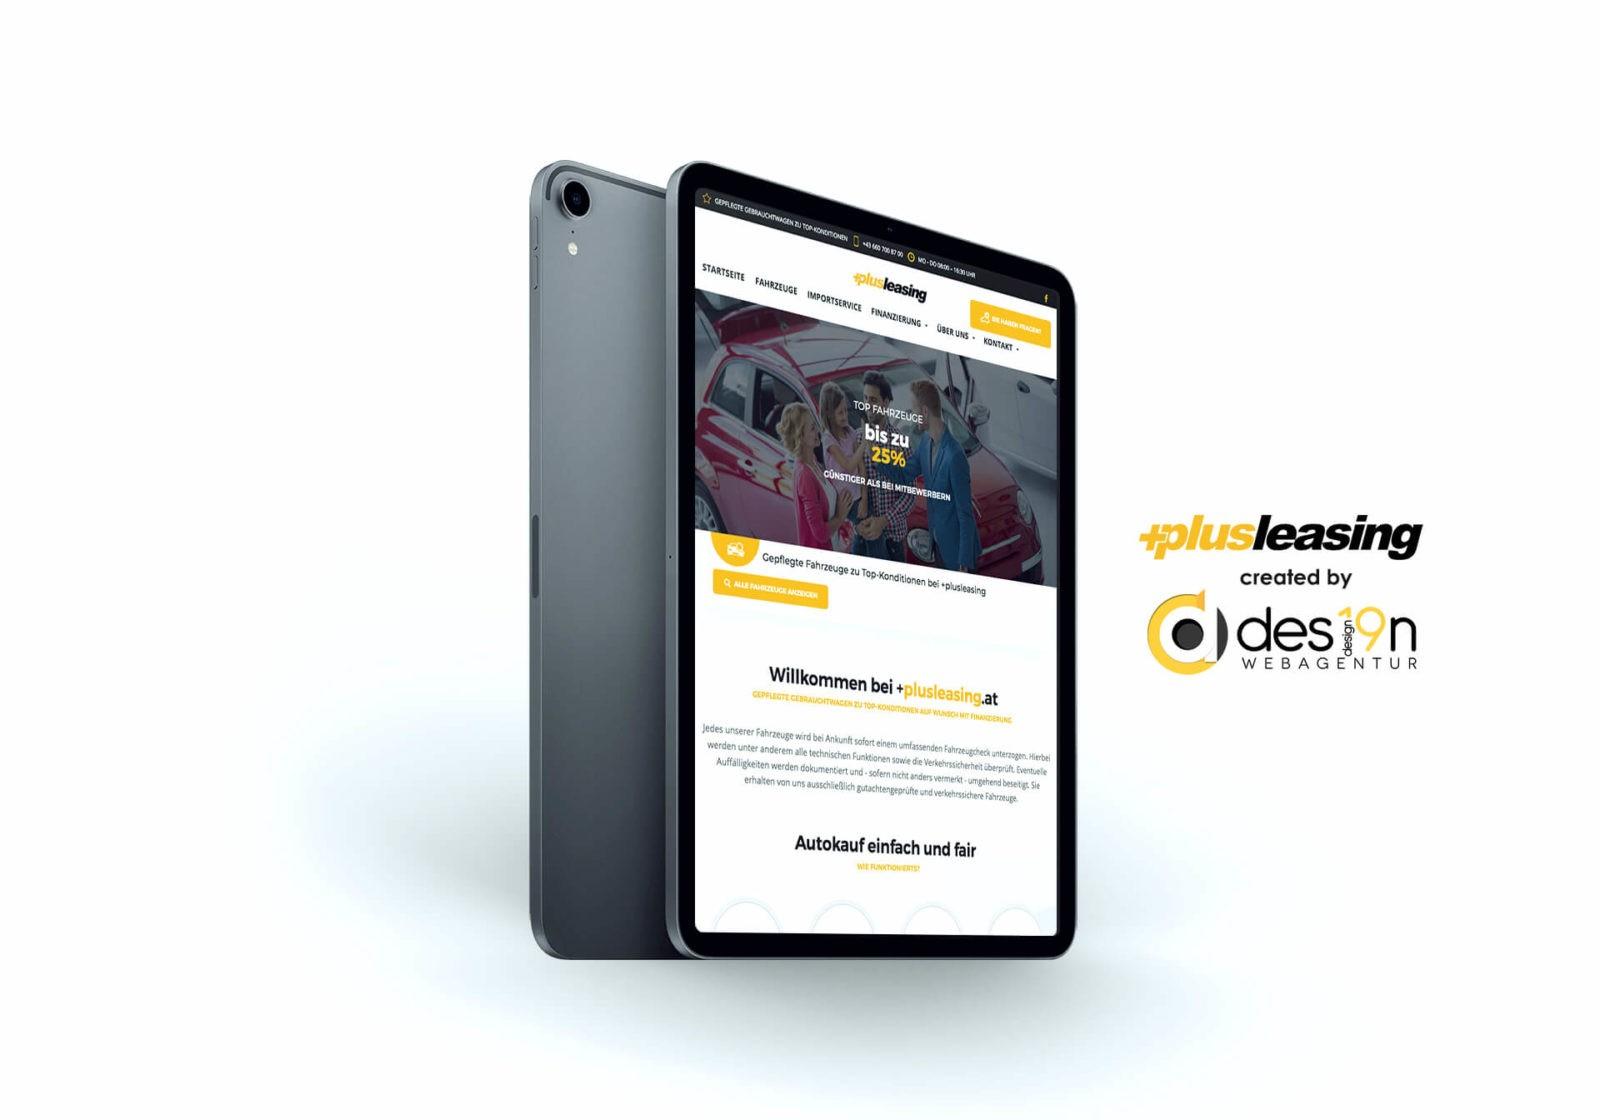 +Plusleasing.at | mobile Ansicht hochgestellt